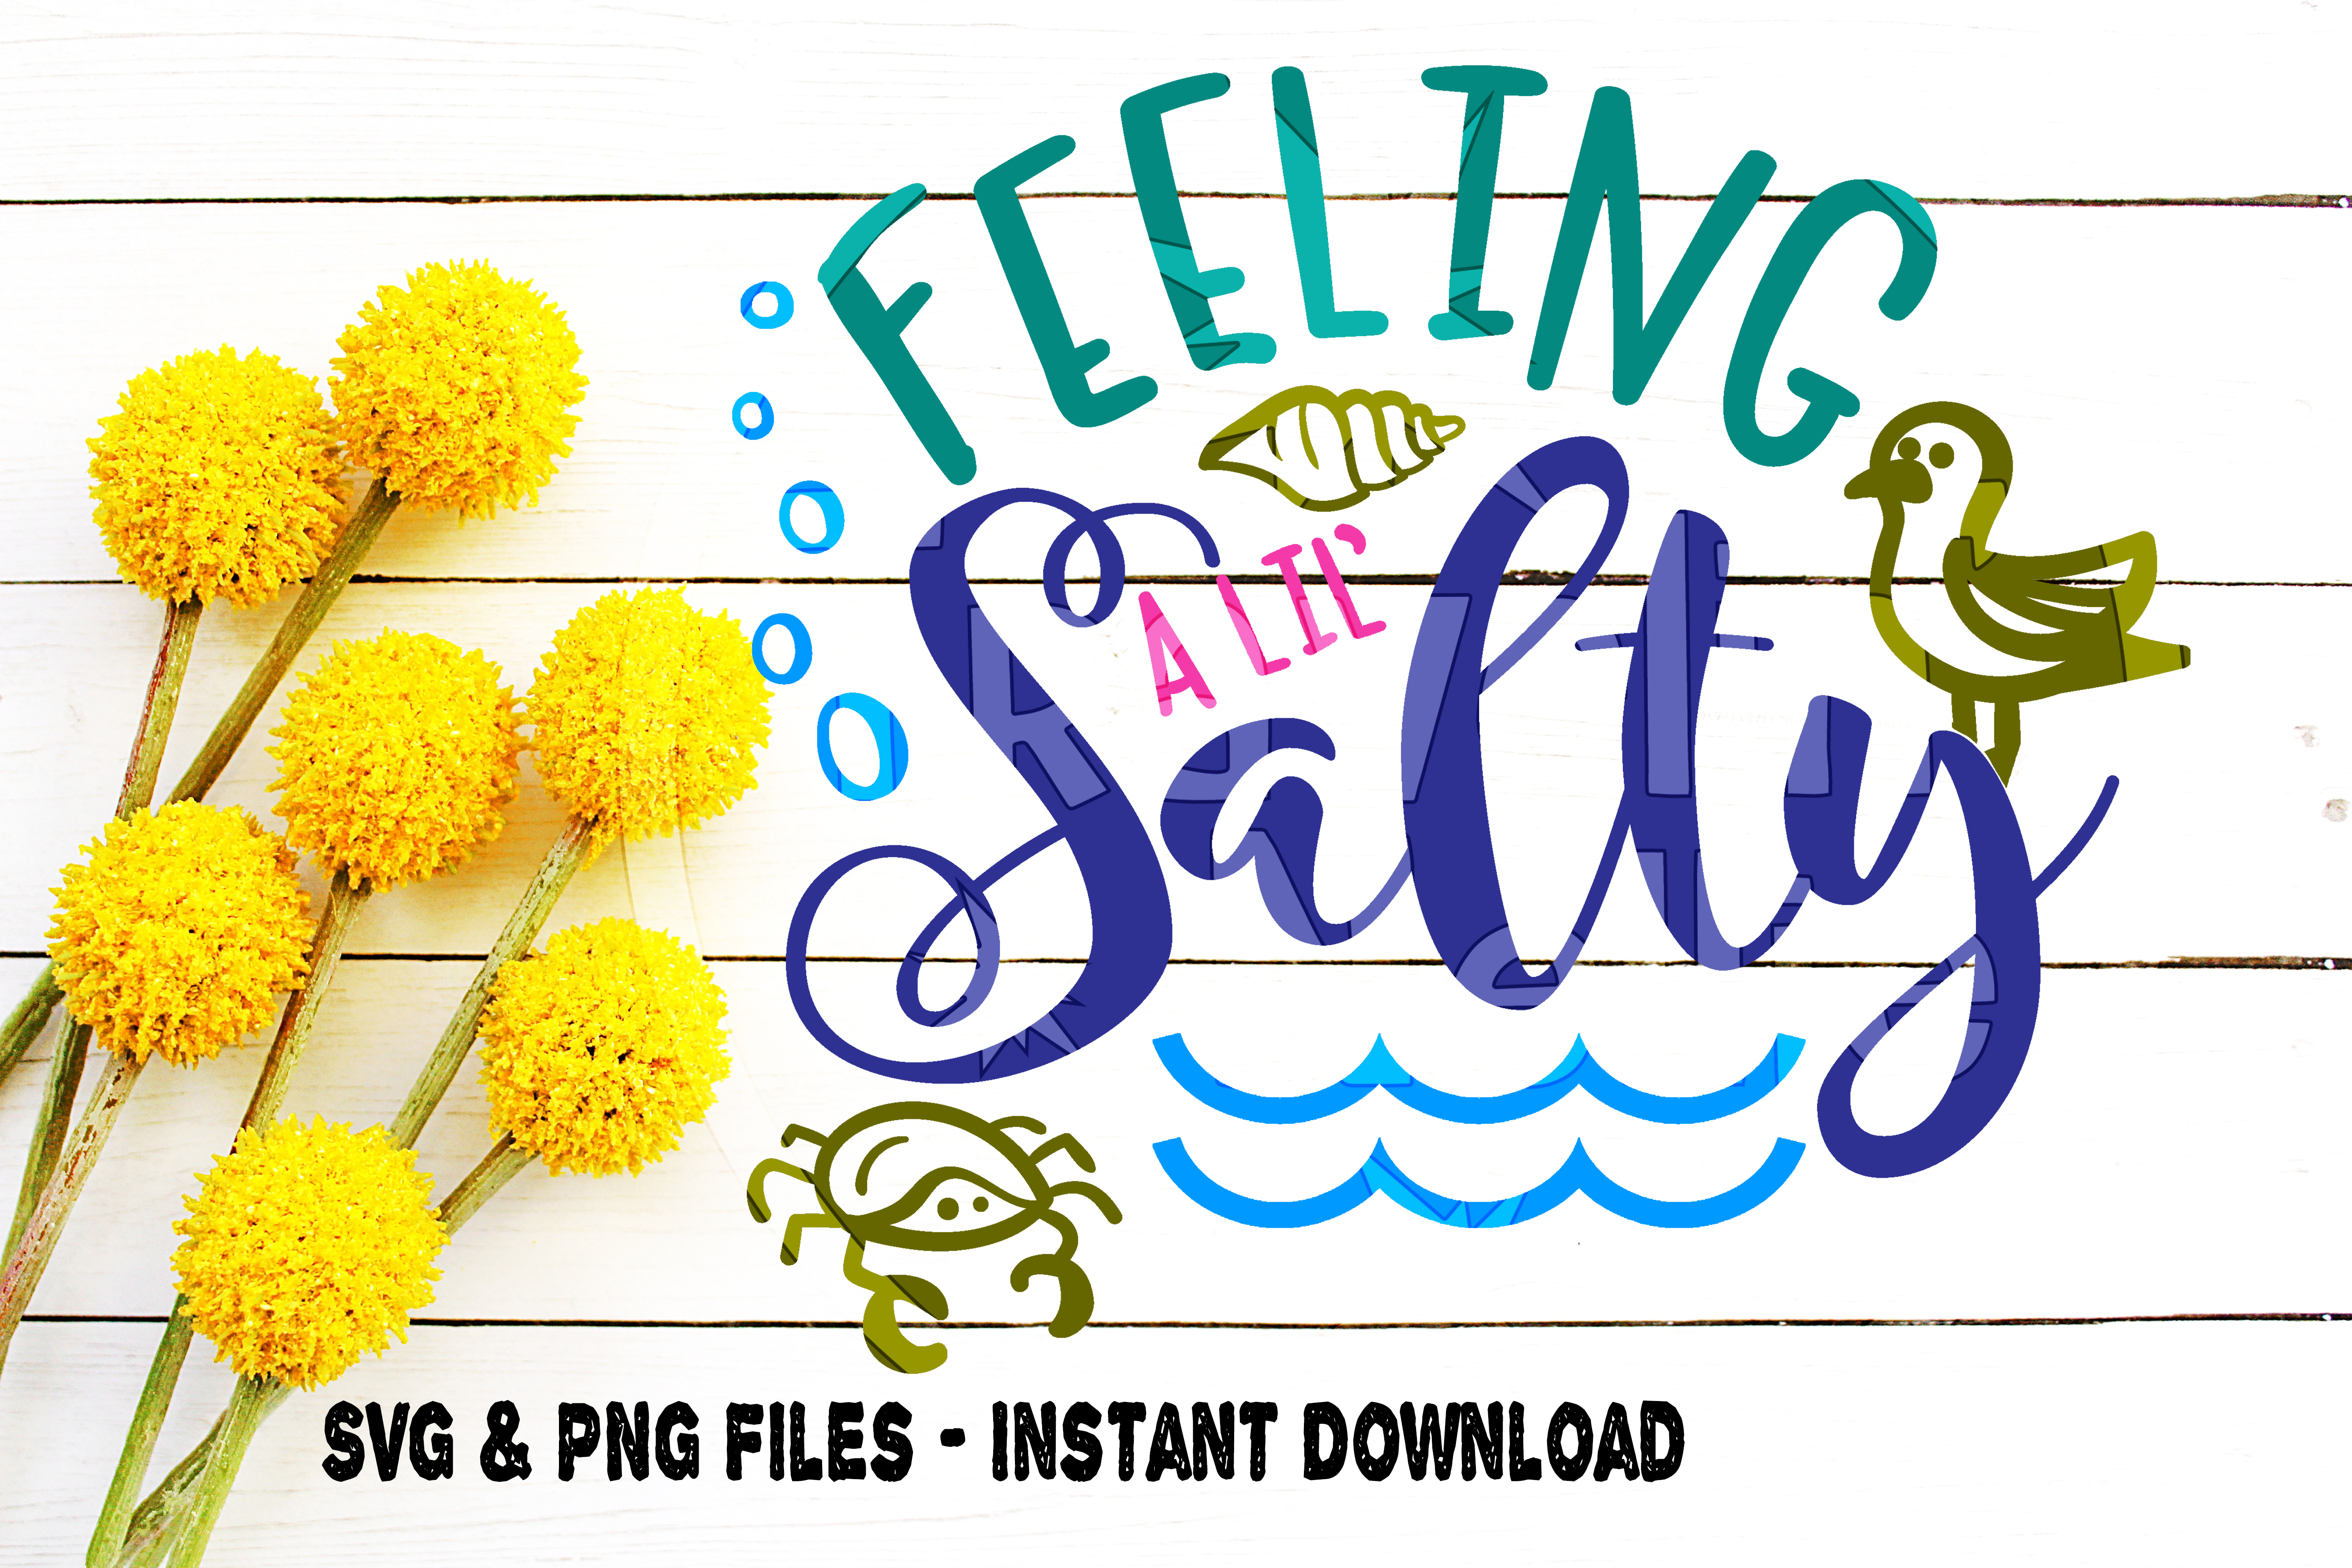 SVG Beach Bundle, 4, Beach Moods svg, Emotions svg, Feeling Nauti svg, Feeling Beachy svg, Feeling Jelly svg, Feeling Salty svg, Cut File example image 2